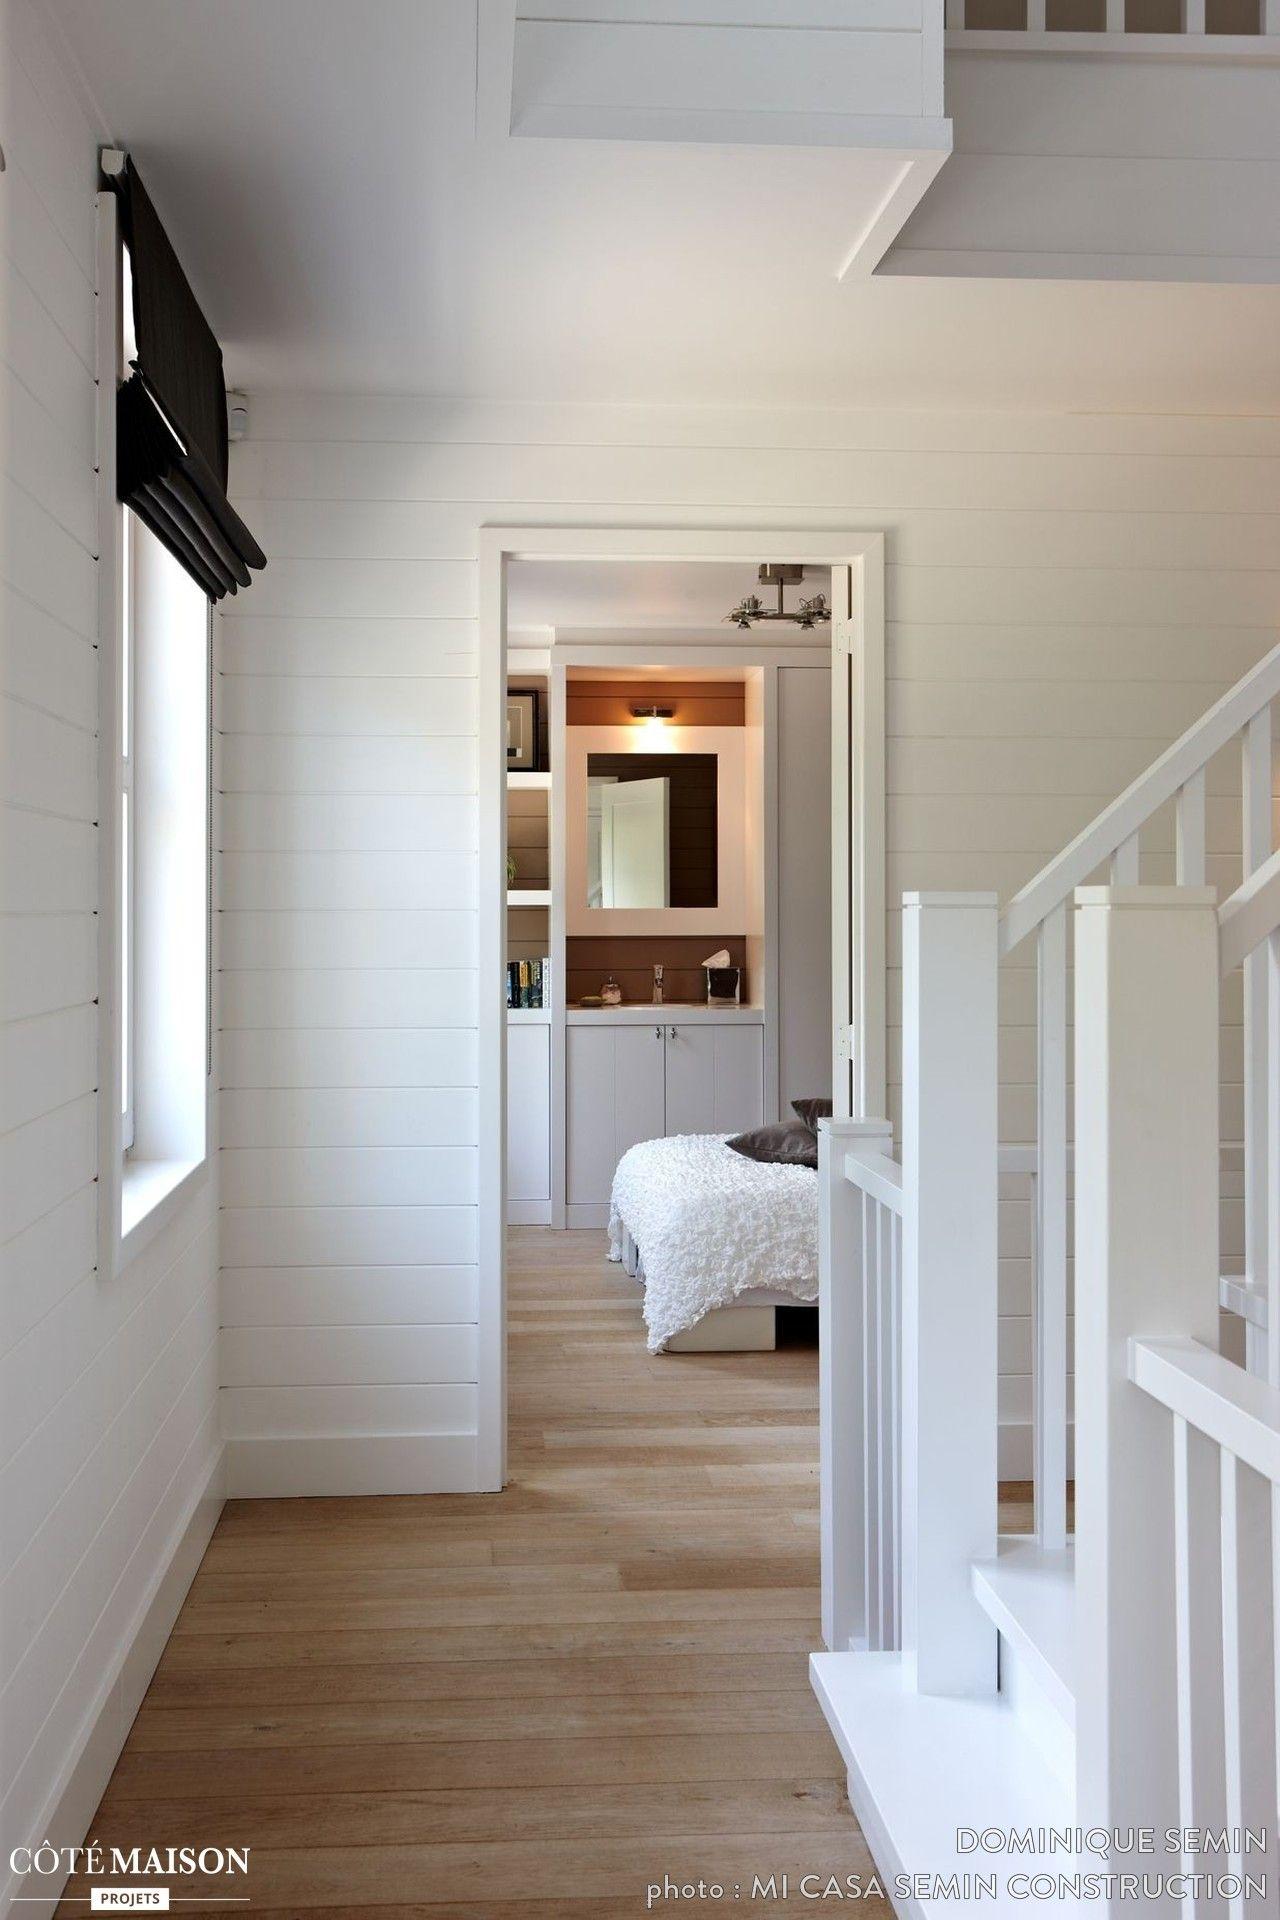 "Style Nouvelle Angleterre les escaliers blancs d'une maison style ""nouvelle angleterre"" | l"